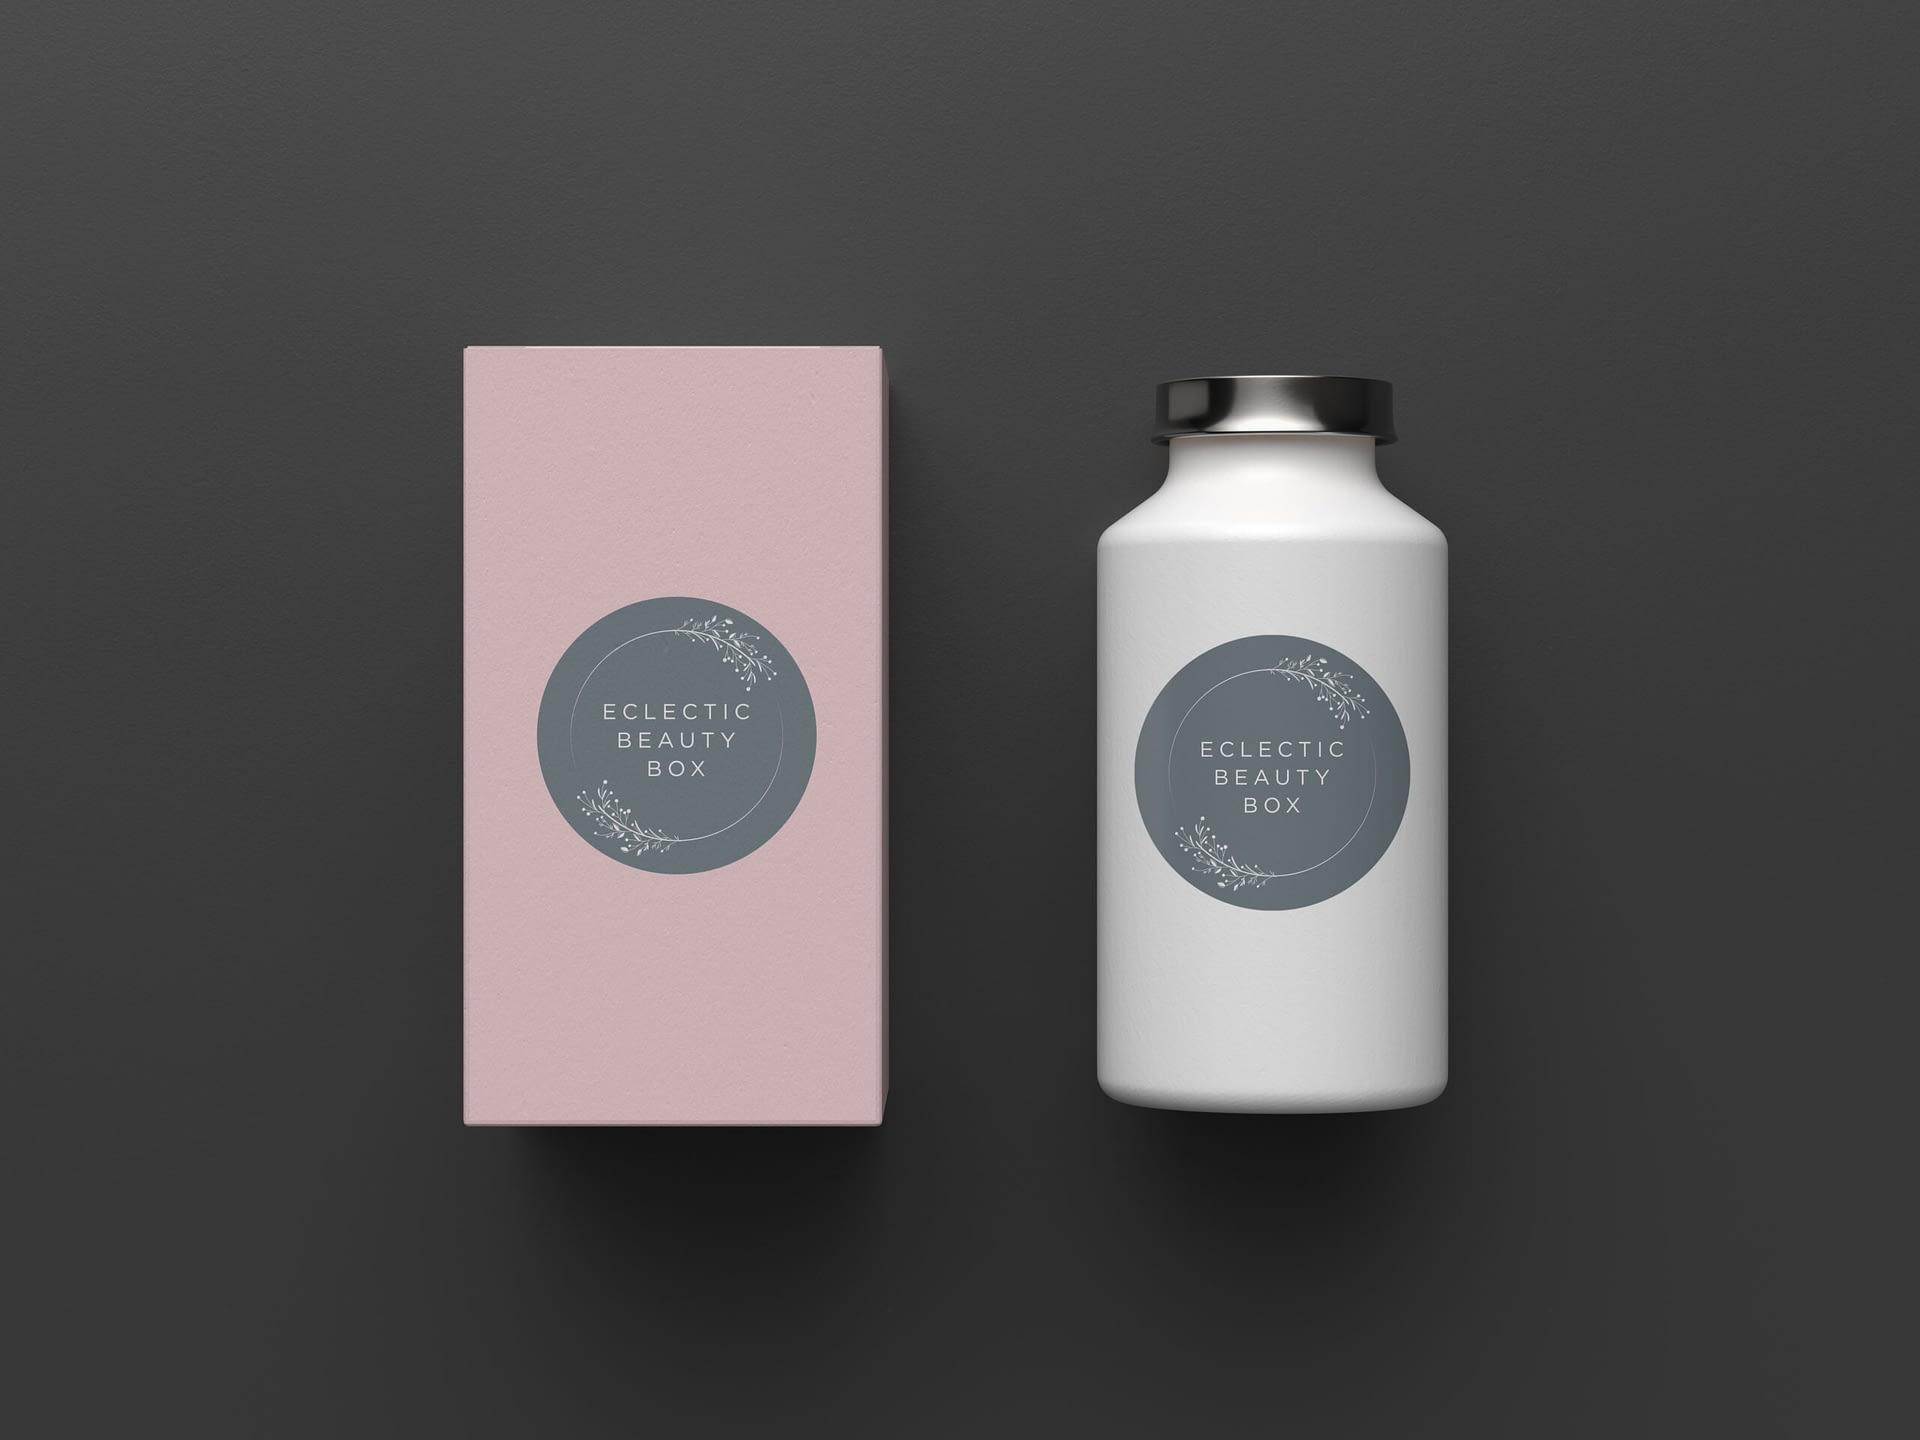 Eclectic Beauty Box Branding Logo Design Identity